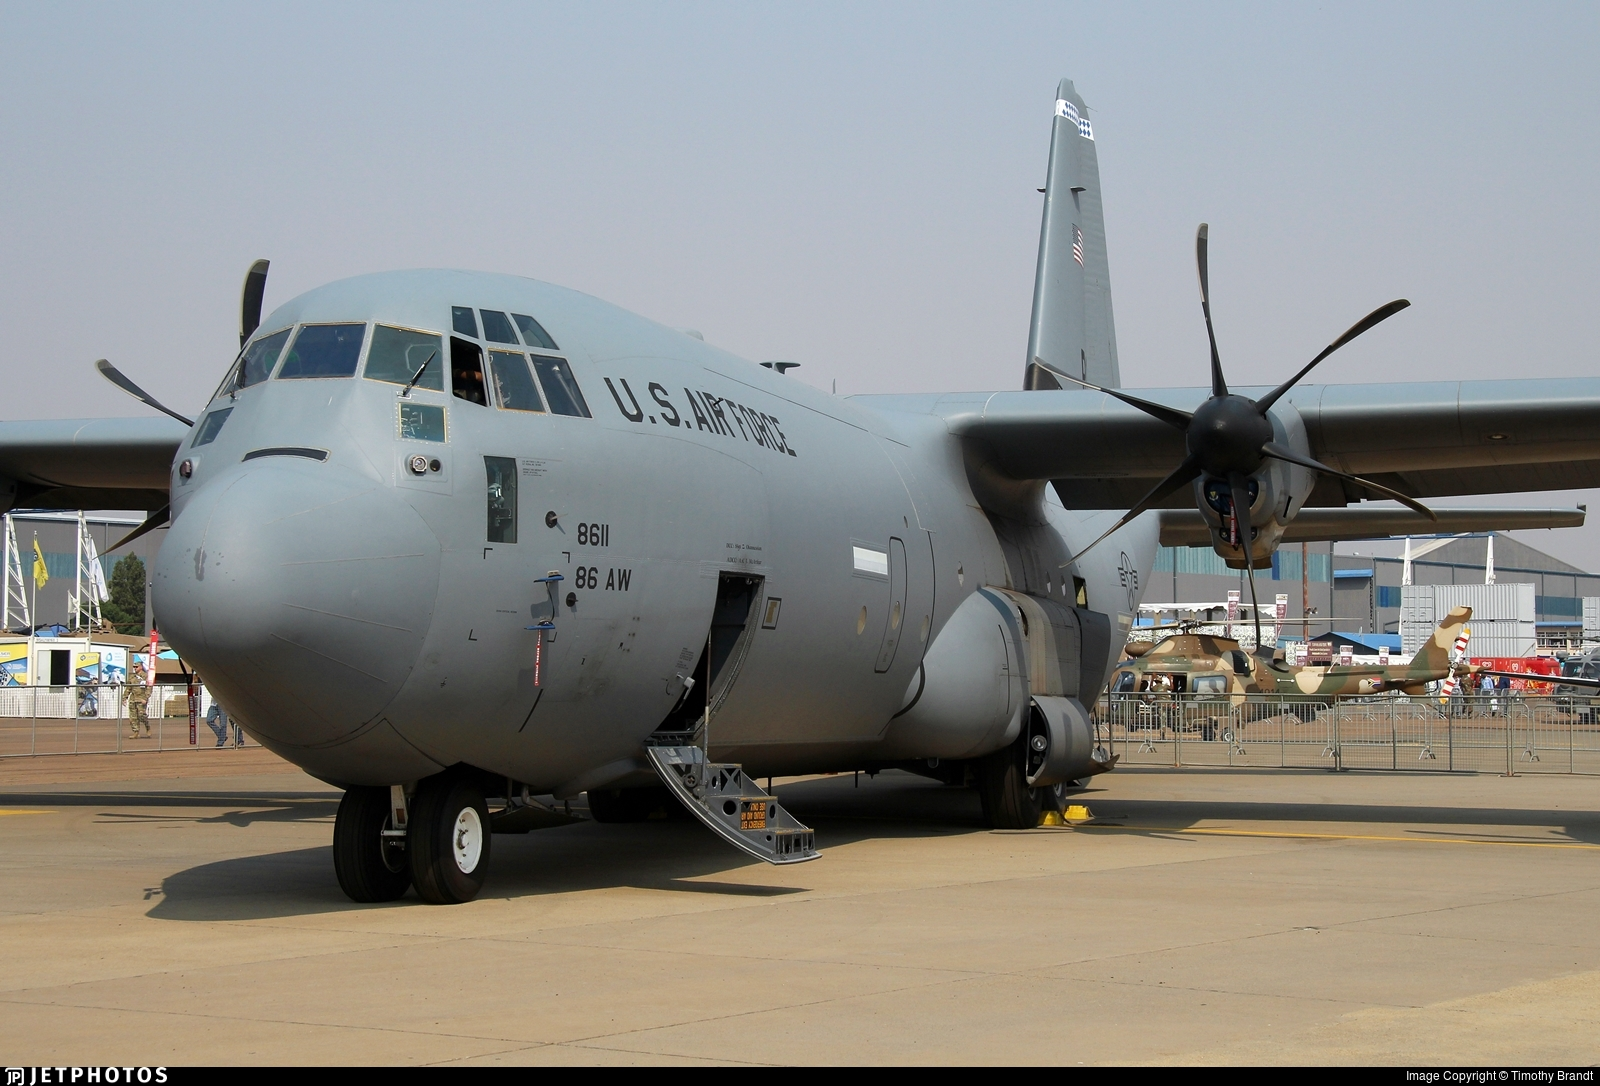 06-8611 - Lockheed Martin C-130J-30 Hercules - United States -